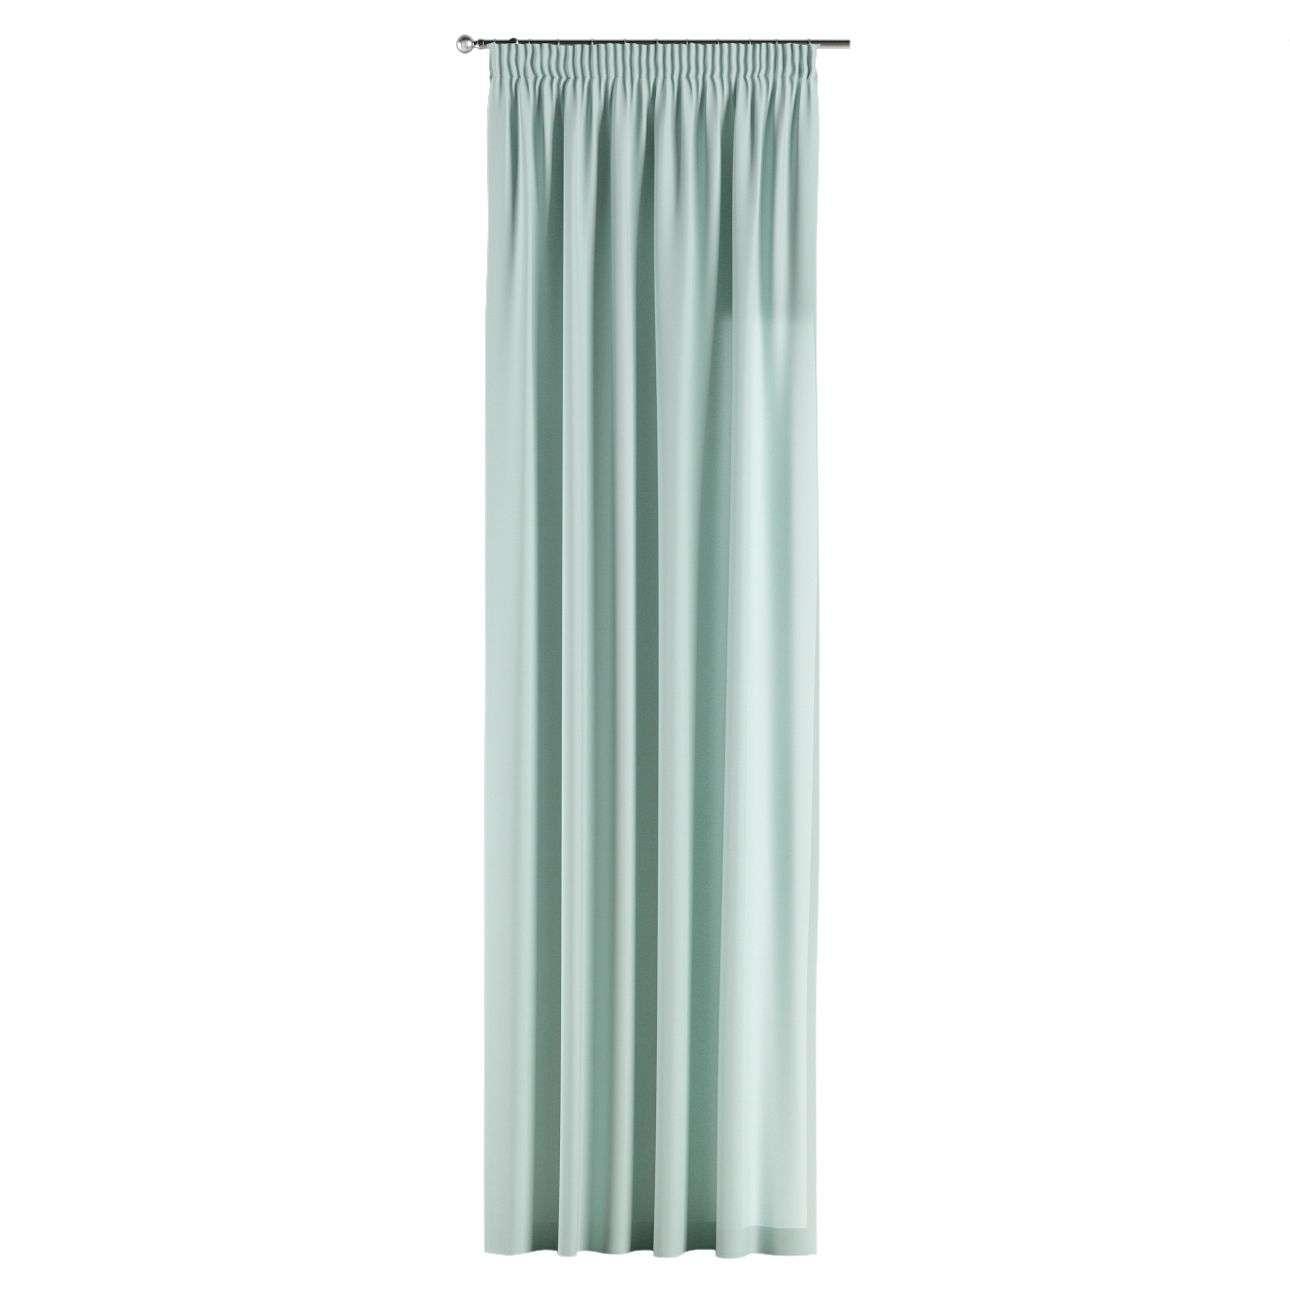 Gardin med rynkebånd 130 x 260 cm fra kollektionen Cotton Panama, Stof: 702-10